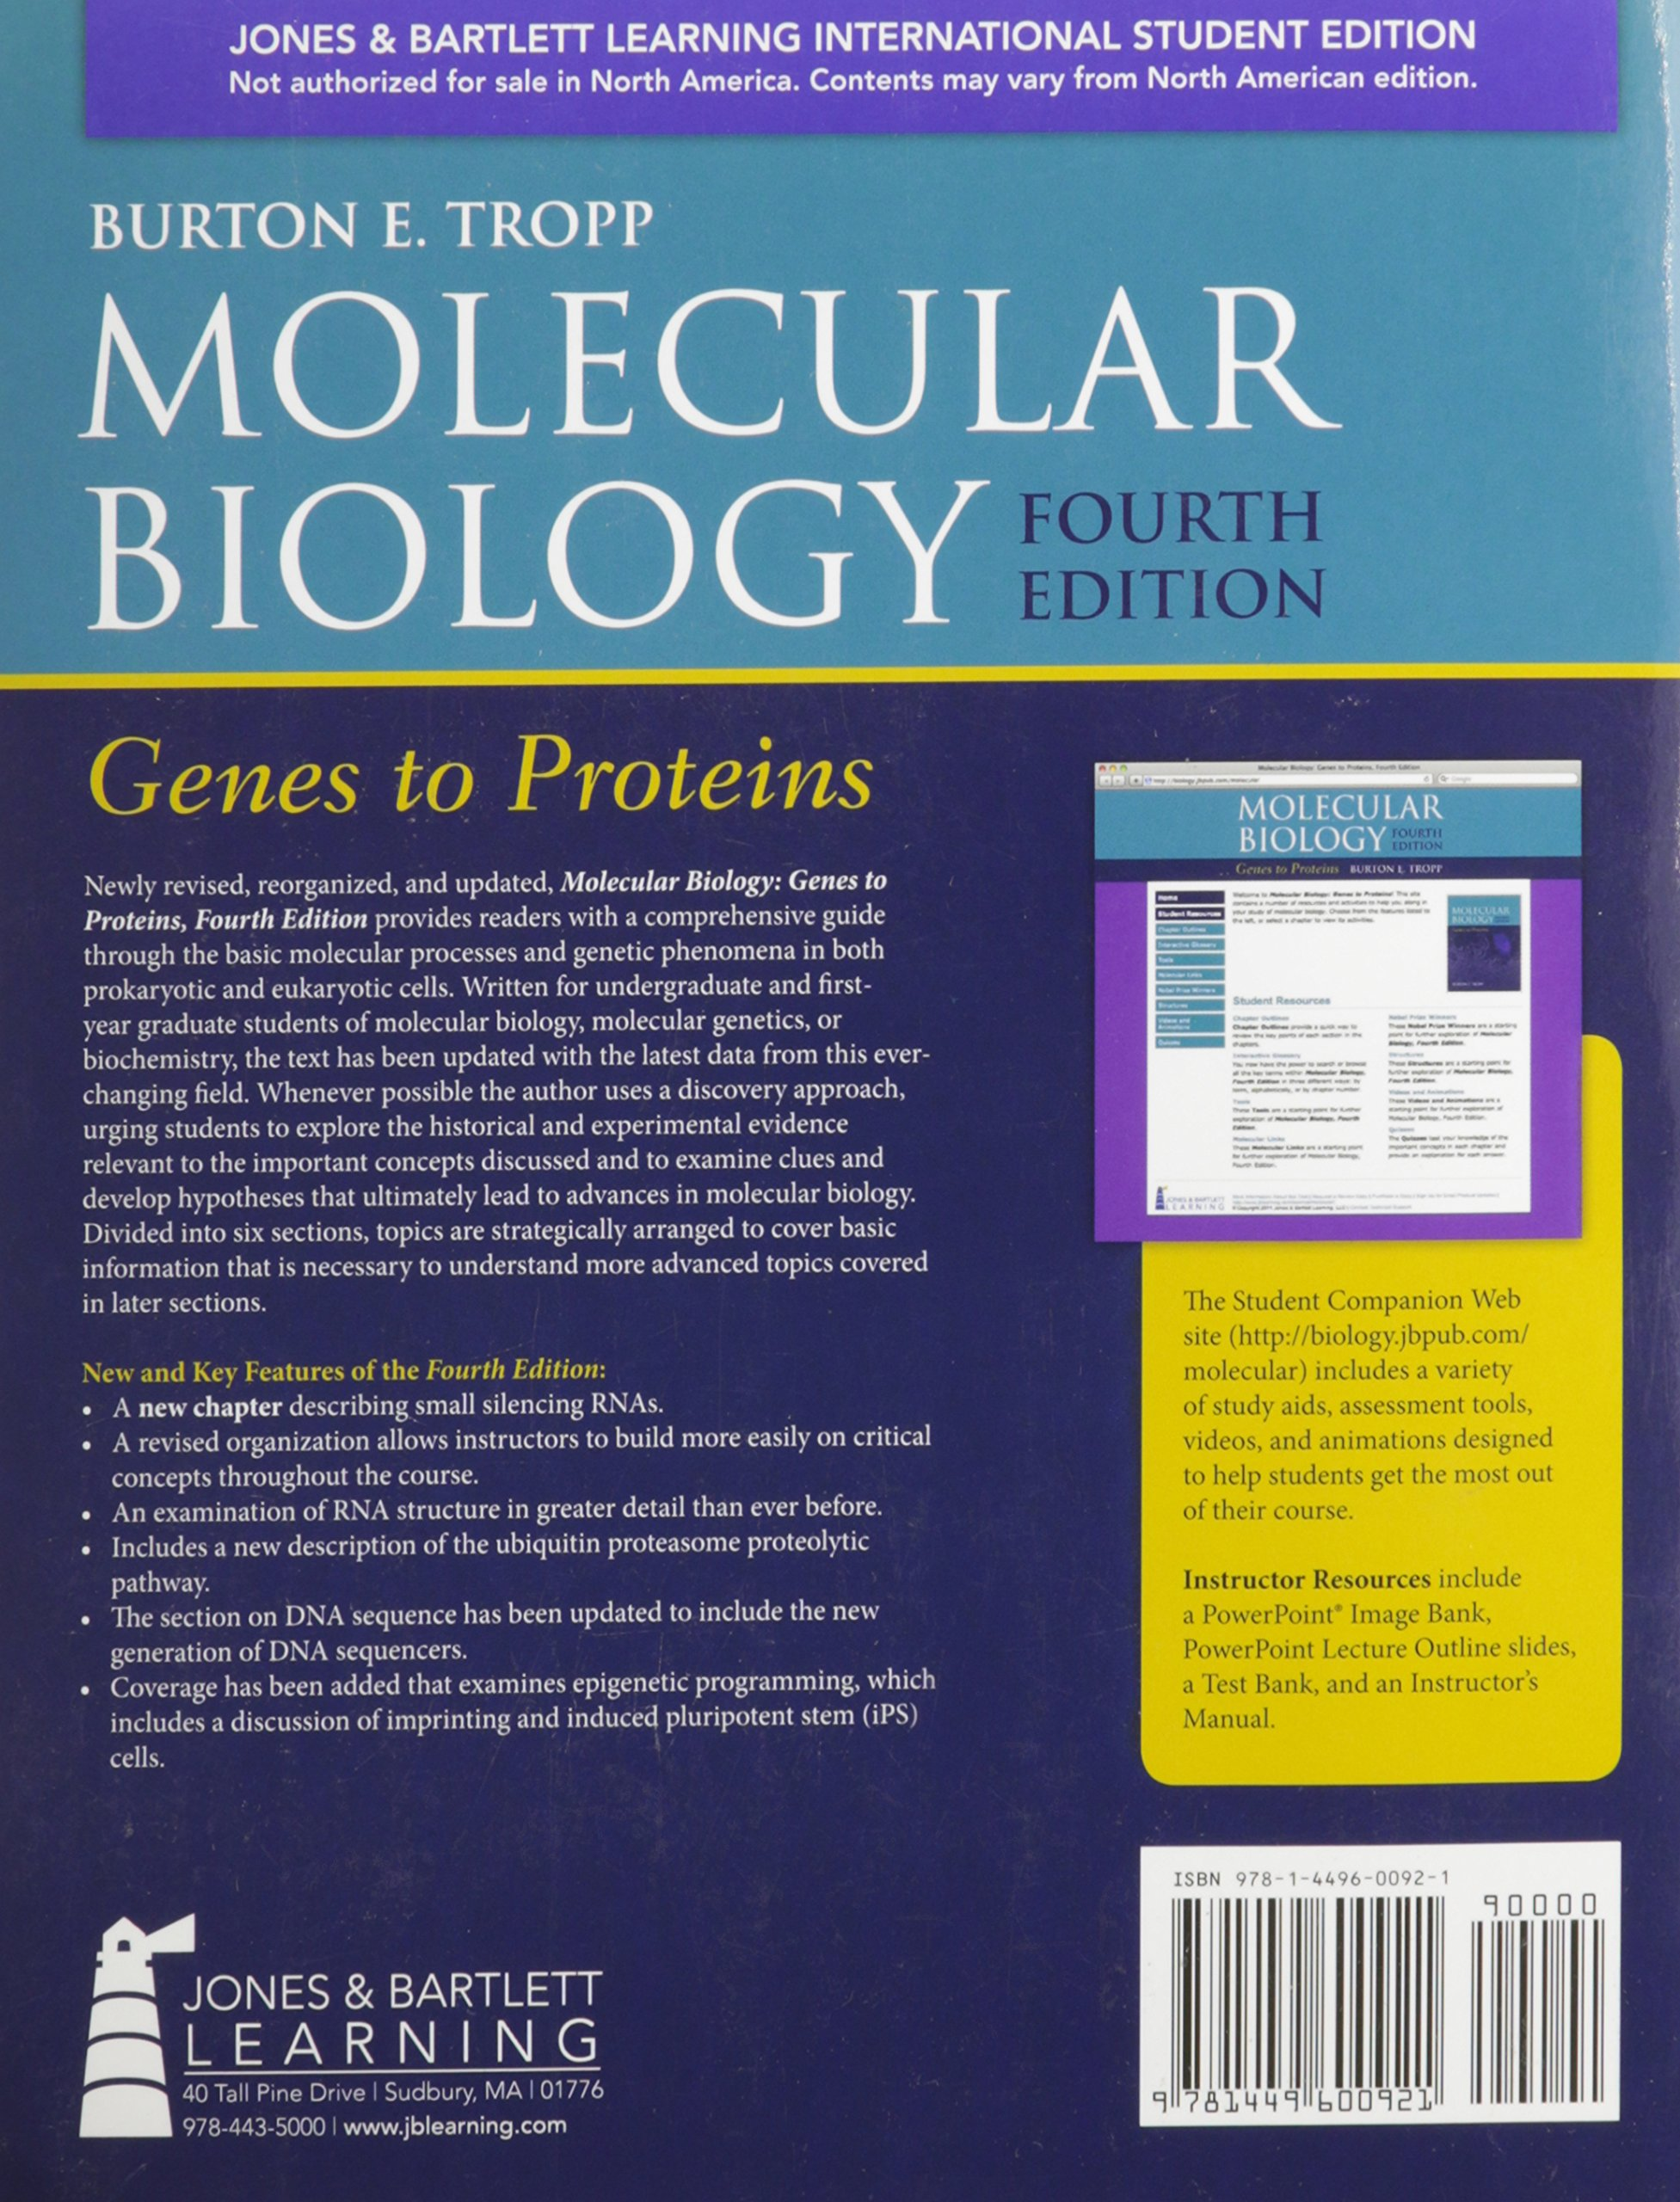 Molecular Biology: Genes to Proteins by Burton E. Tropp